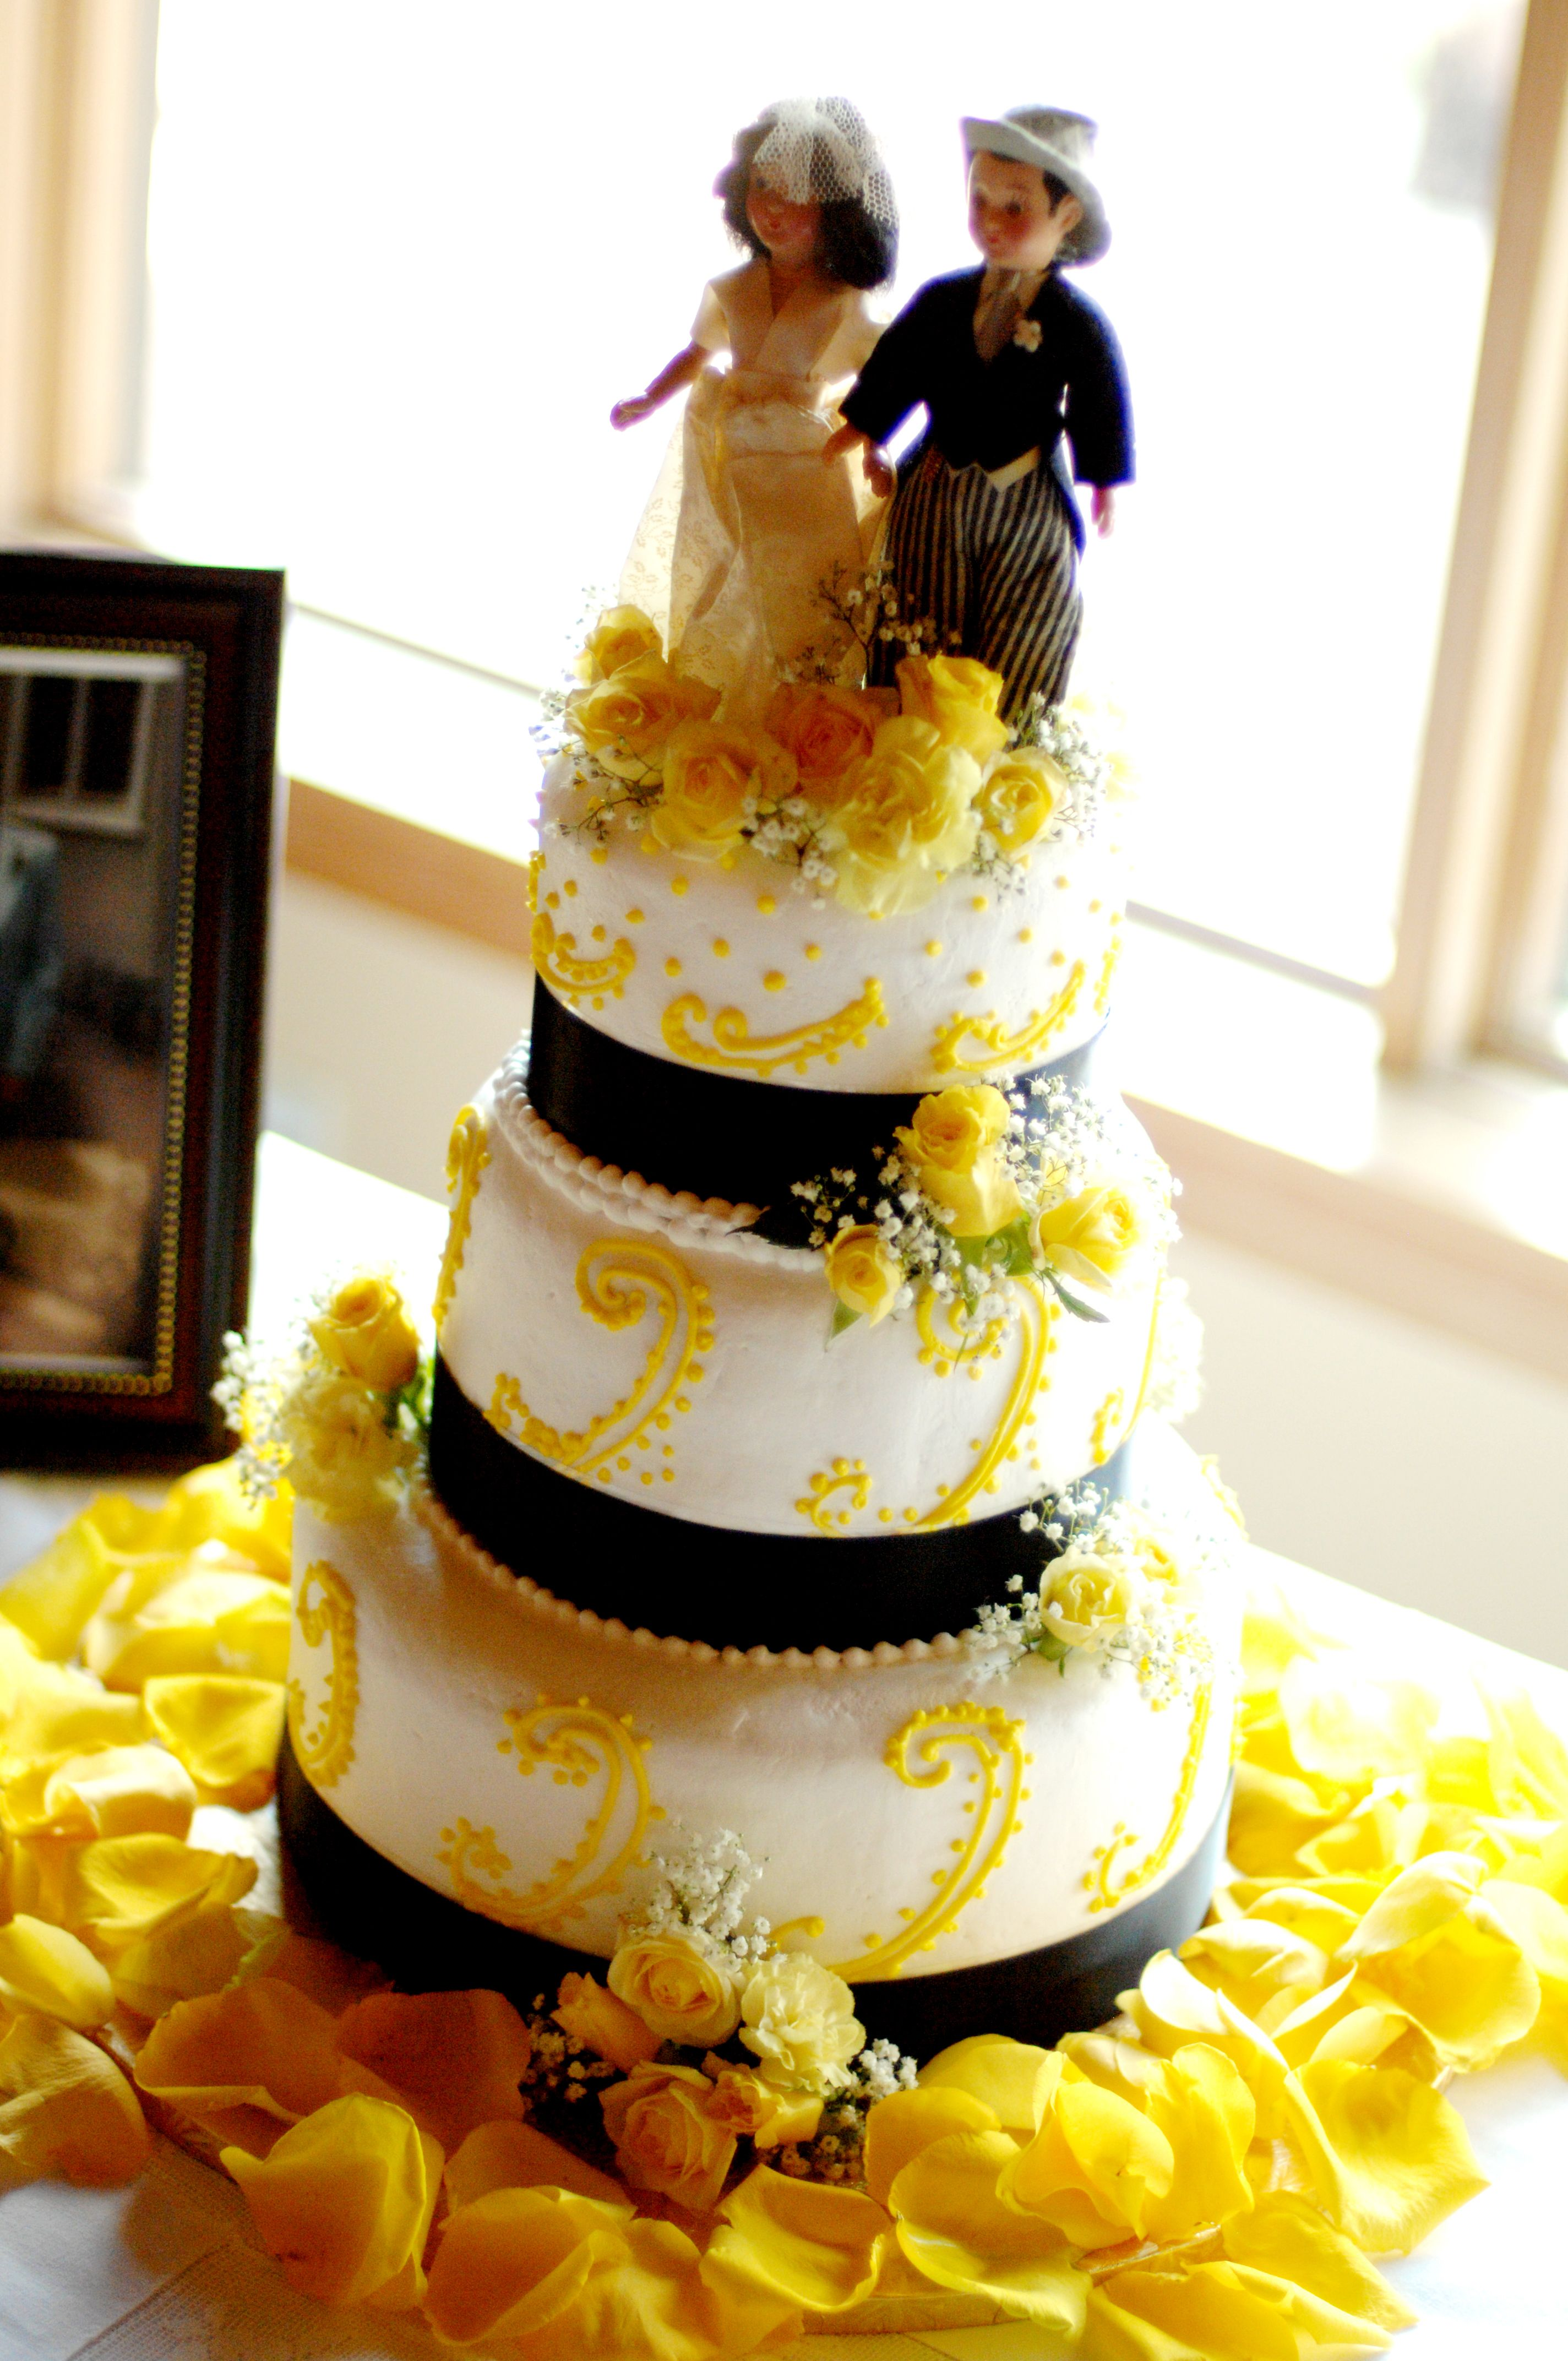 Yellow, black, and white wedding cake | Our Wedding | Pinterest ...